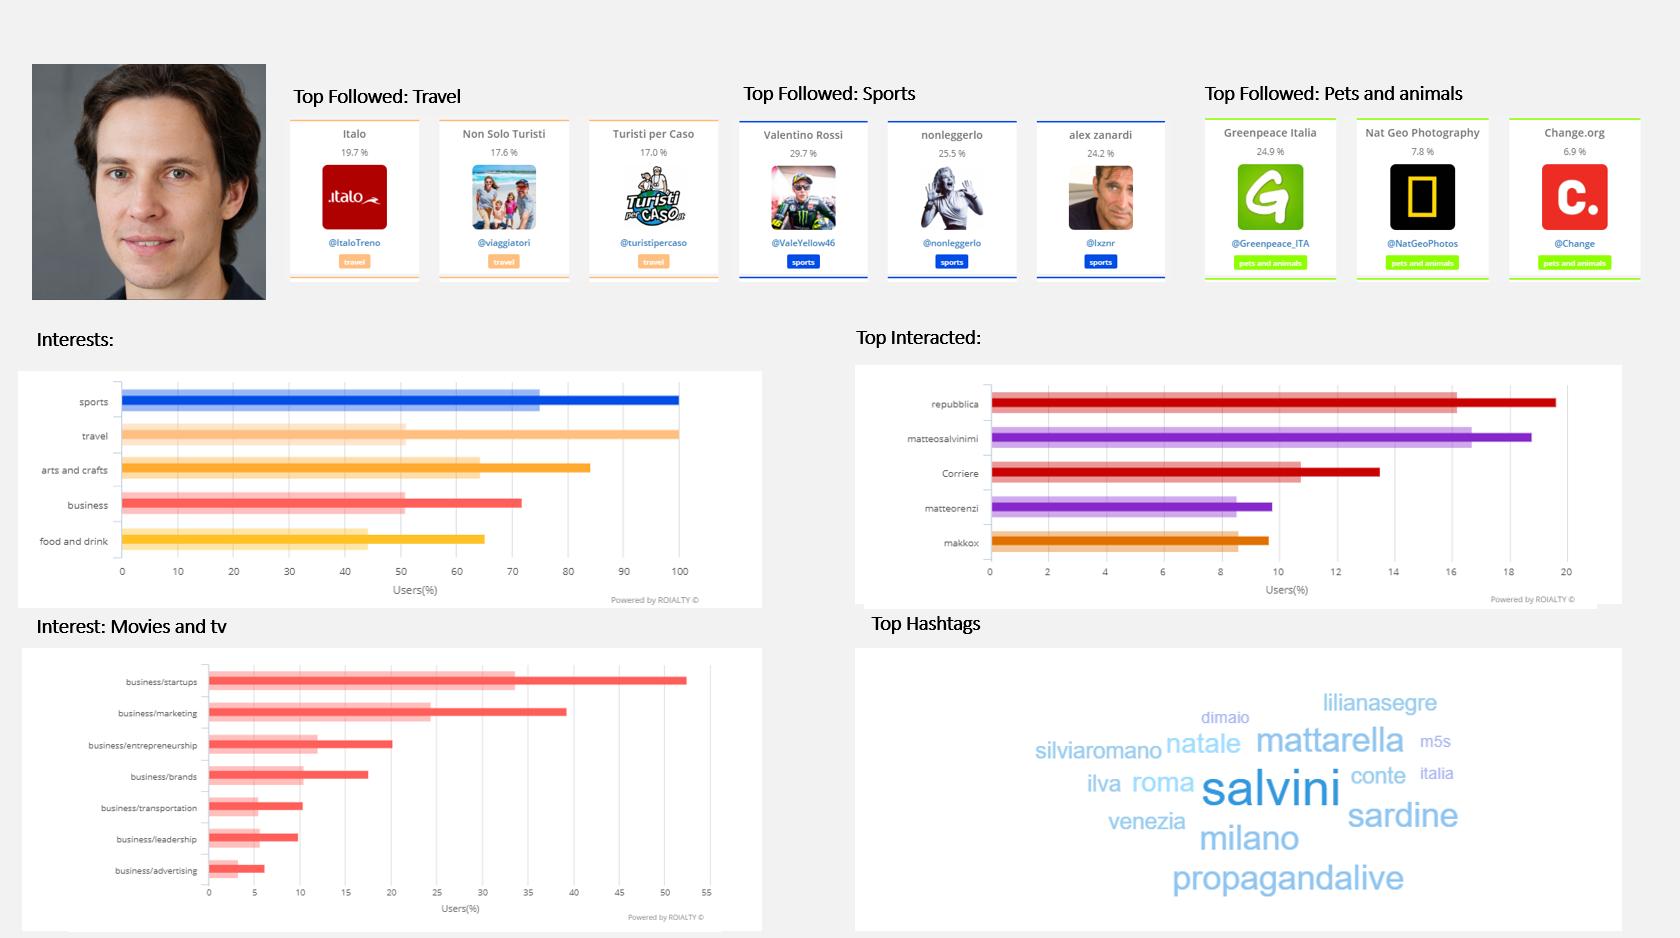 Audience behaviour, interest and attitude social media analysis